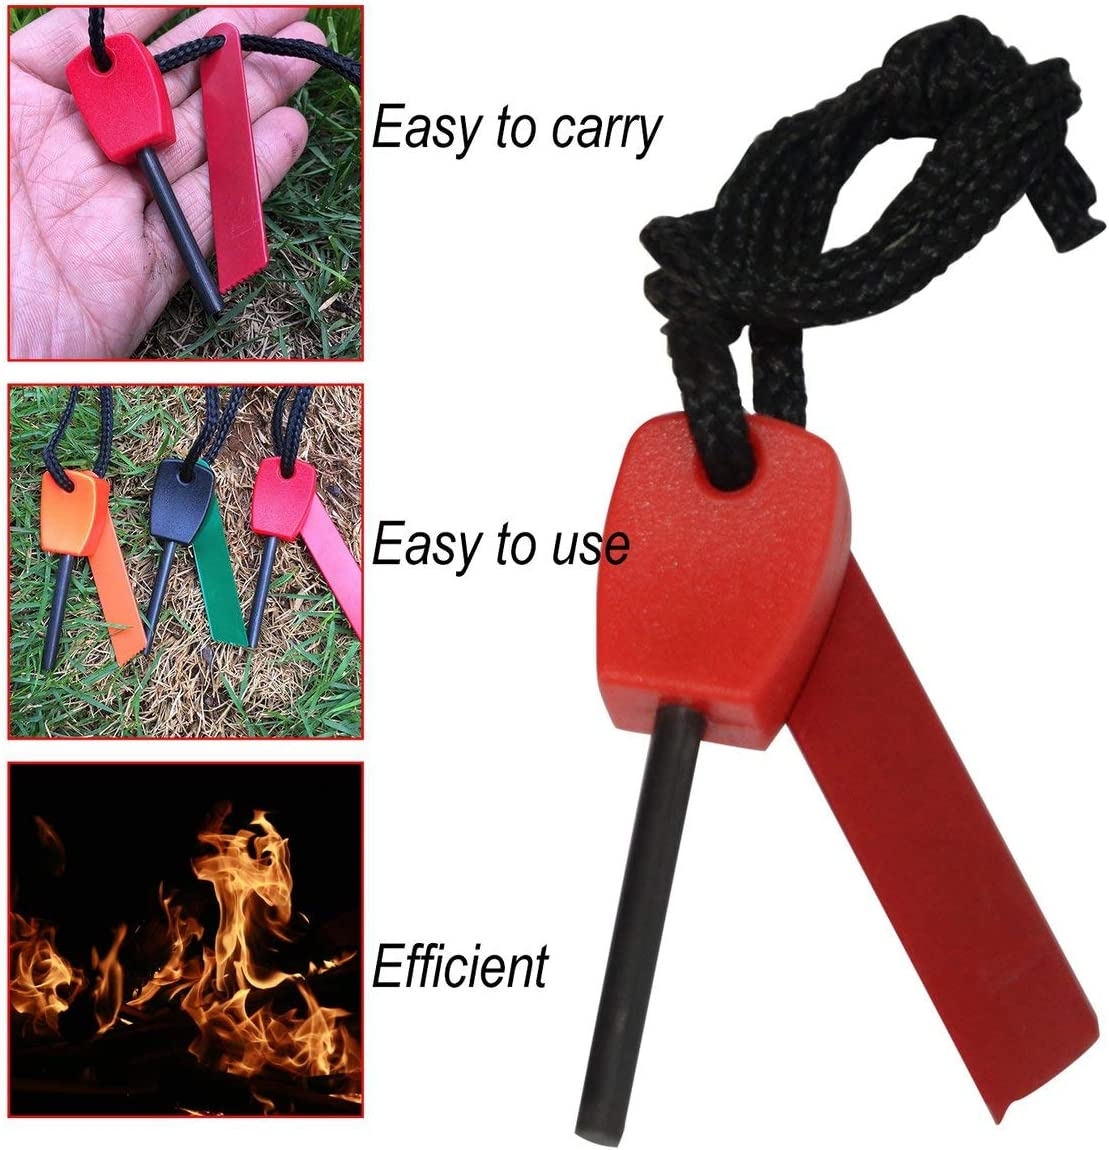 ArgoBar Camping Survival Outdoor Equipment Economic Version Of Mini Flint Waterproofing Fire Magnesium Strip